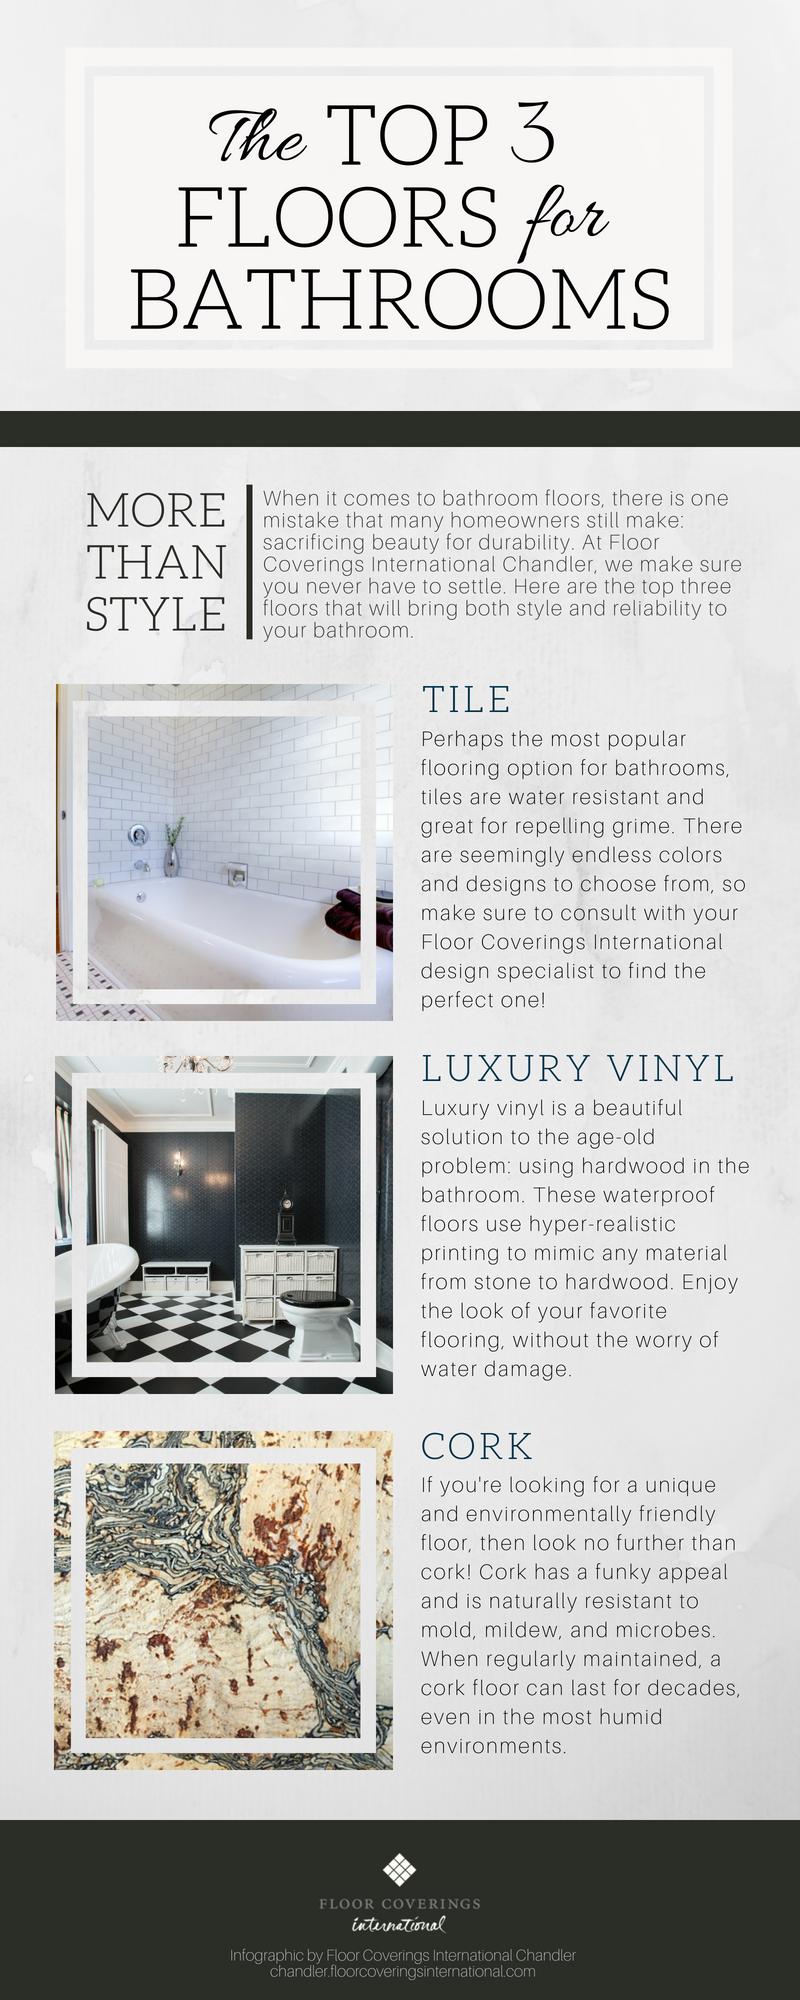 bathroom flooring infographic